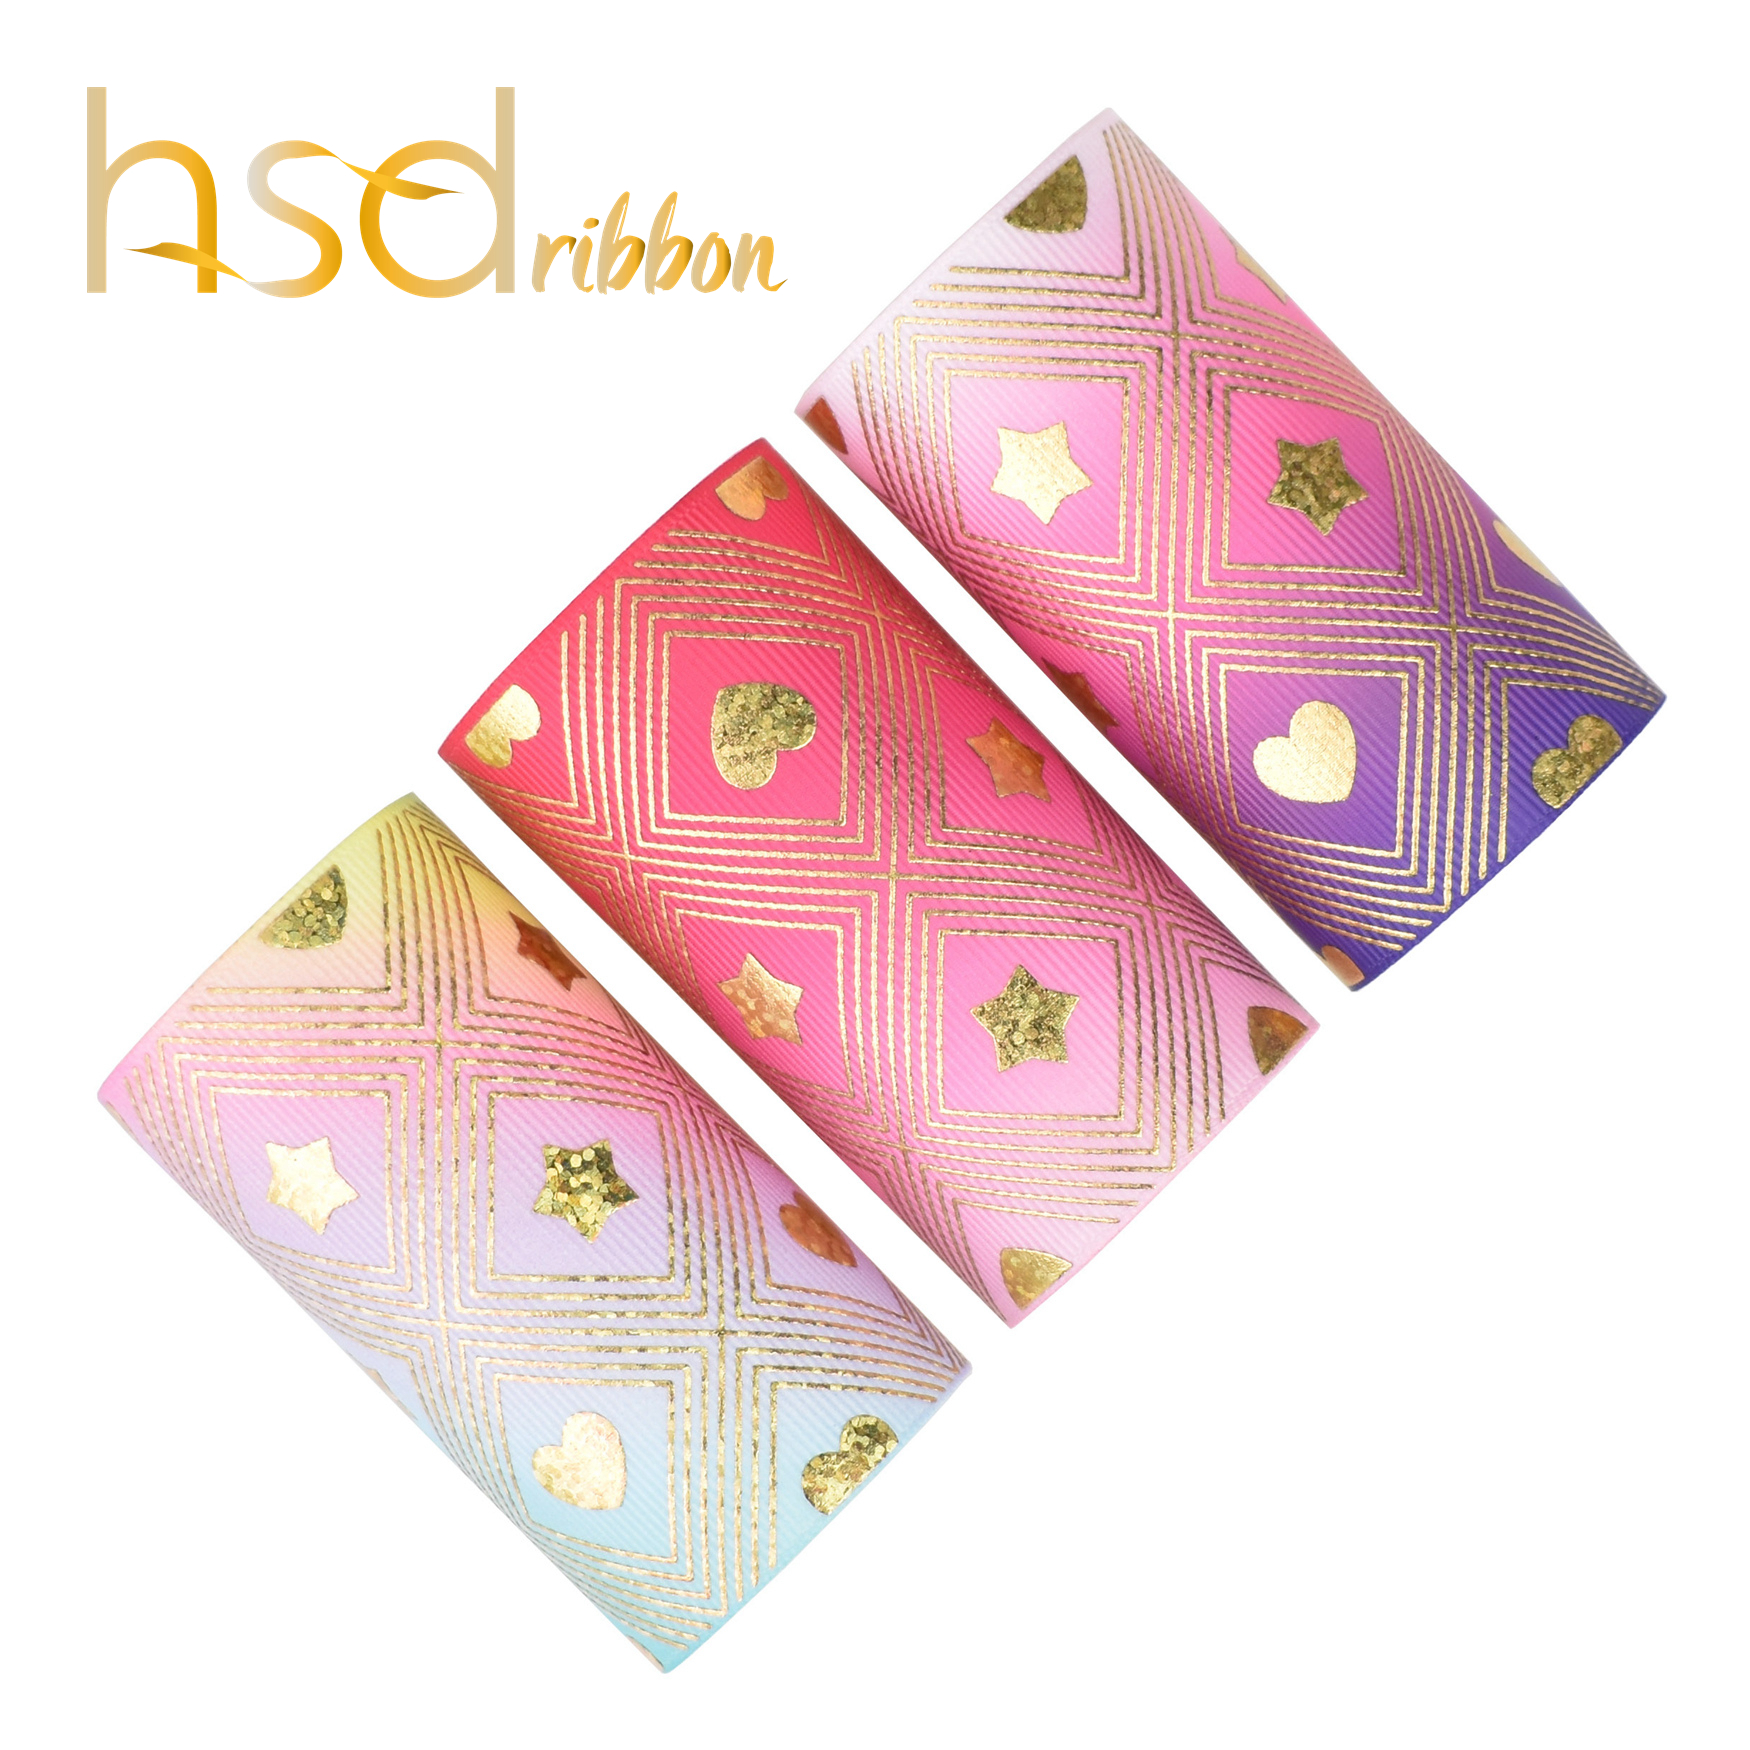 HSDRibbon 3 inch 75MM Custom Valentine s Day series Heat transfer with foil on grosgrain ribbon